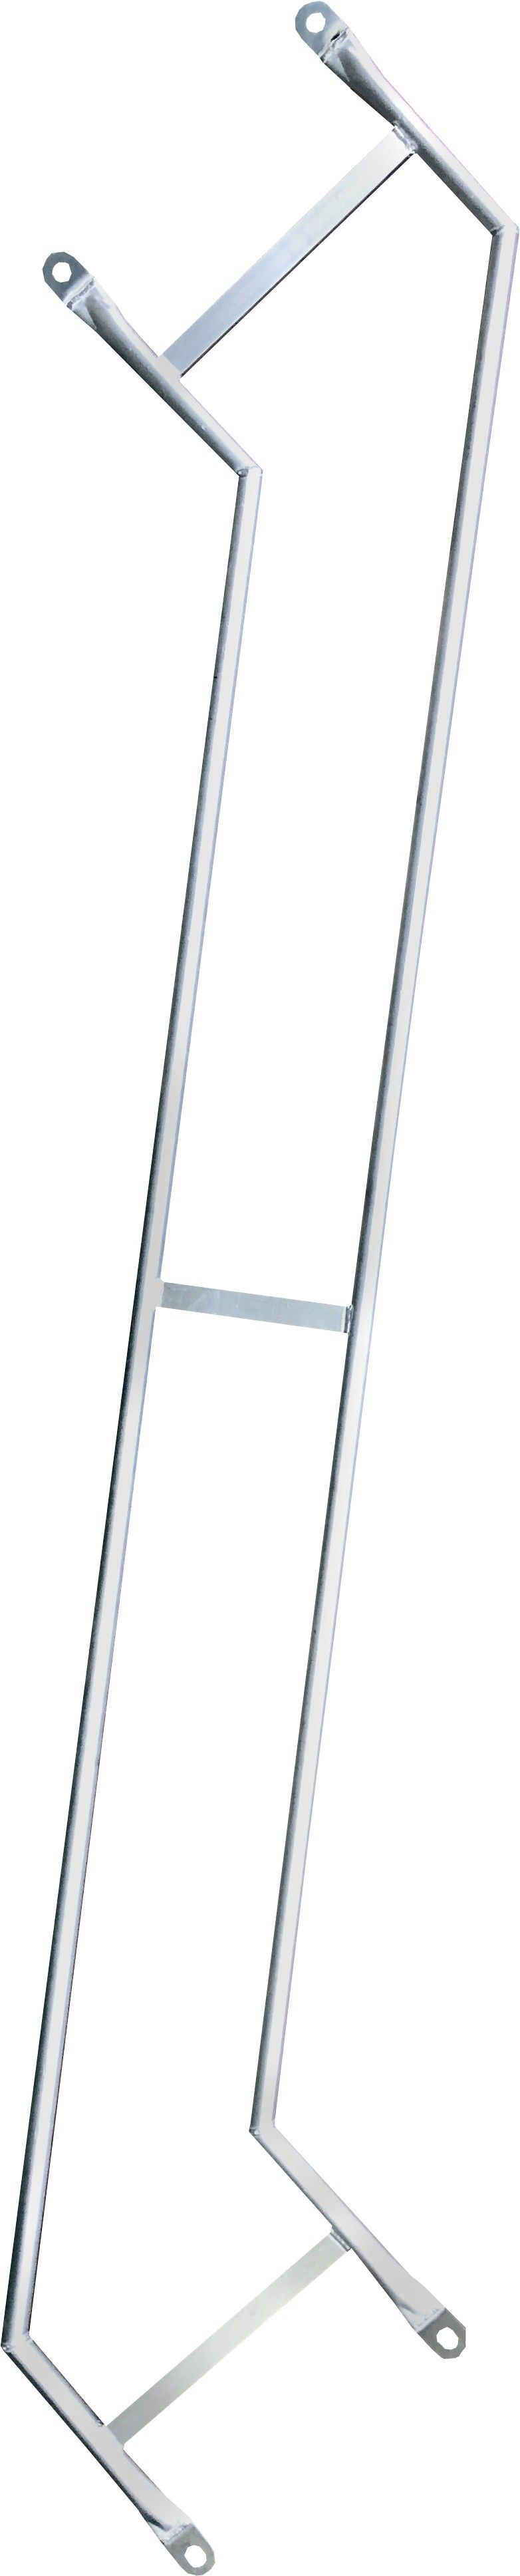 plettac distribution - Stairway alu guardrail